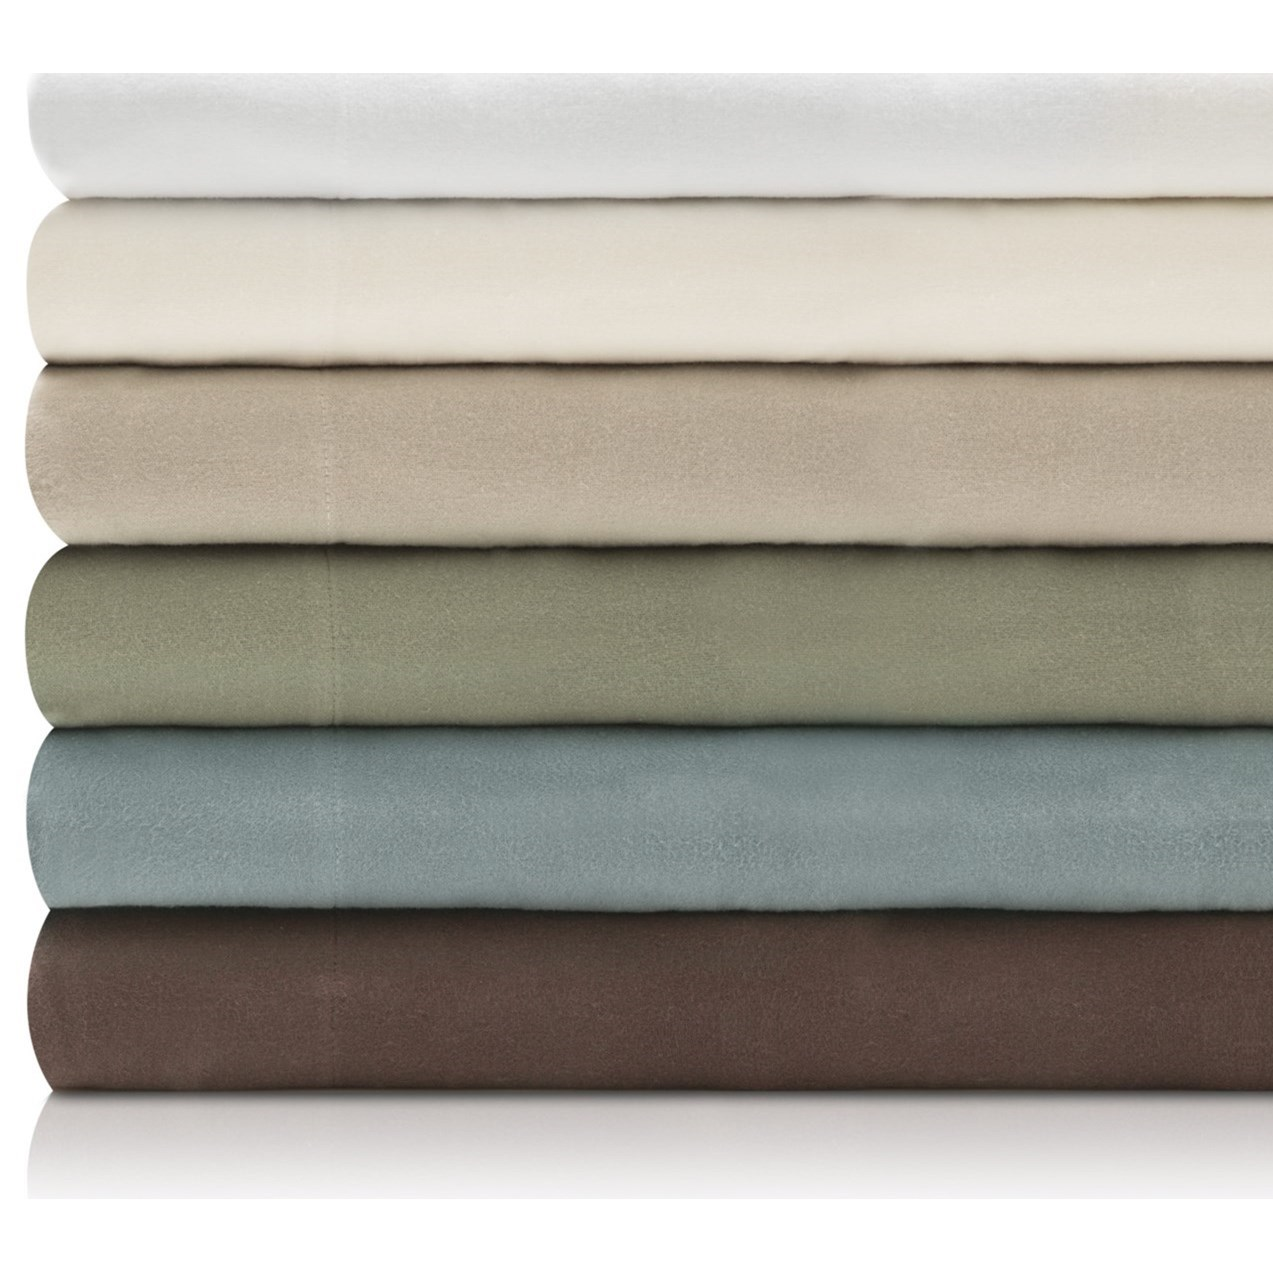 Malouf Portuguese Flannel King Woven™ Portuguese Flannel Sheet Set - Item Number: WO19KKPAFS